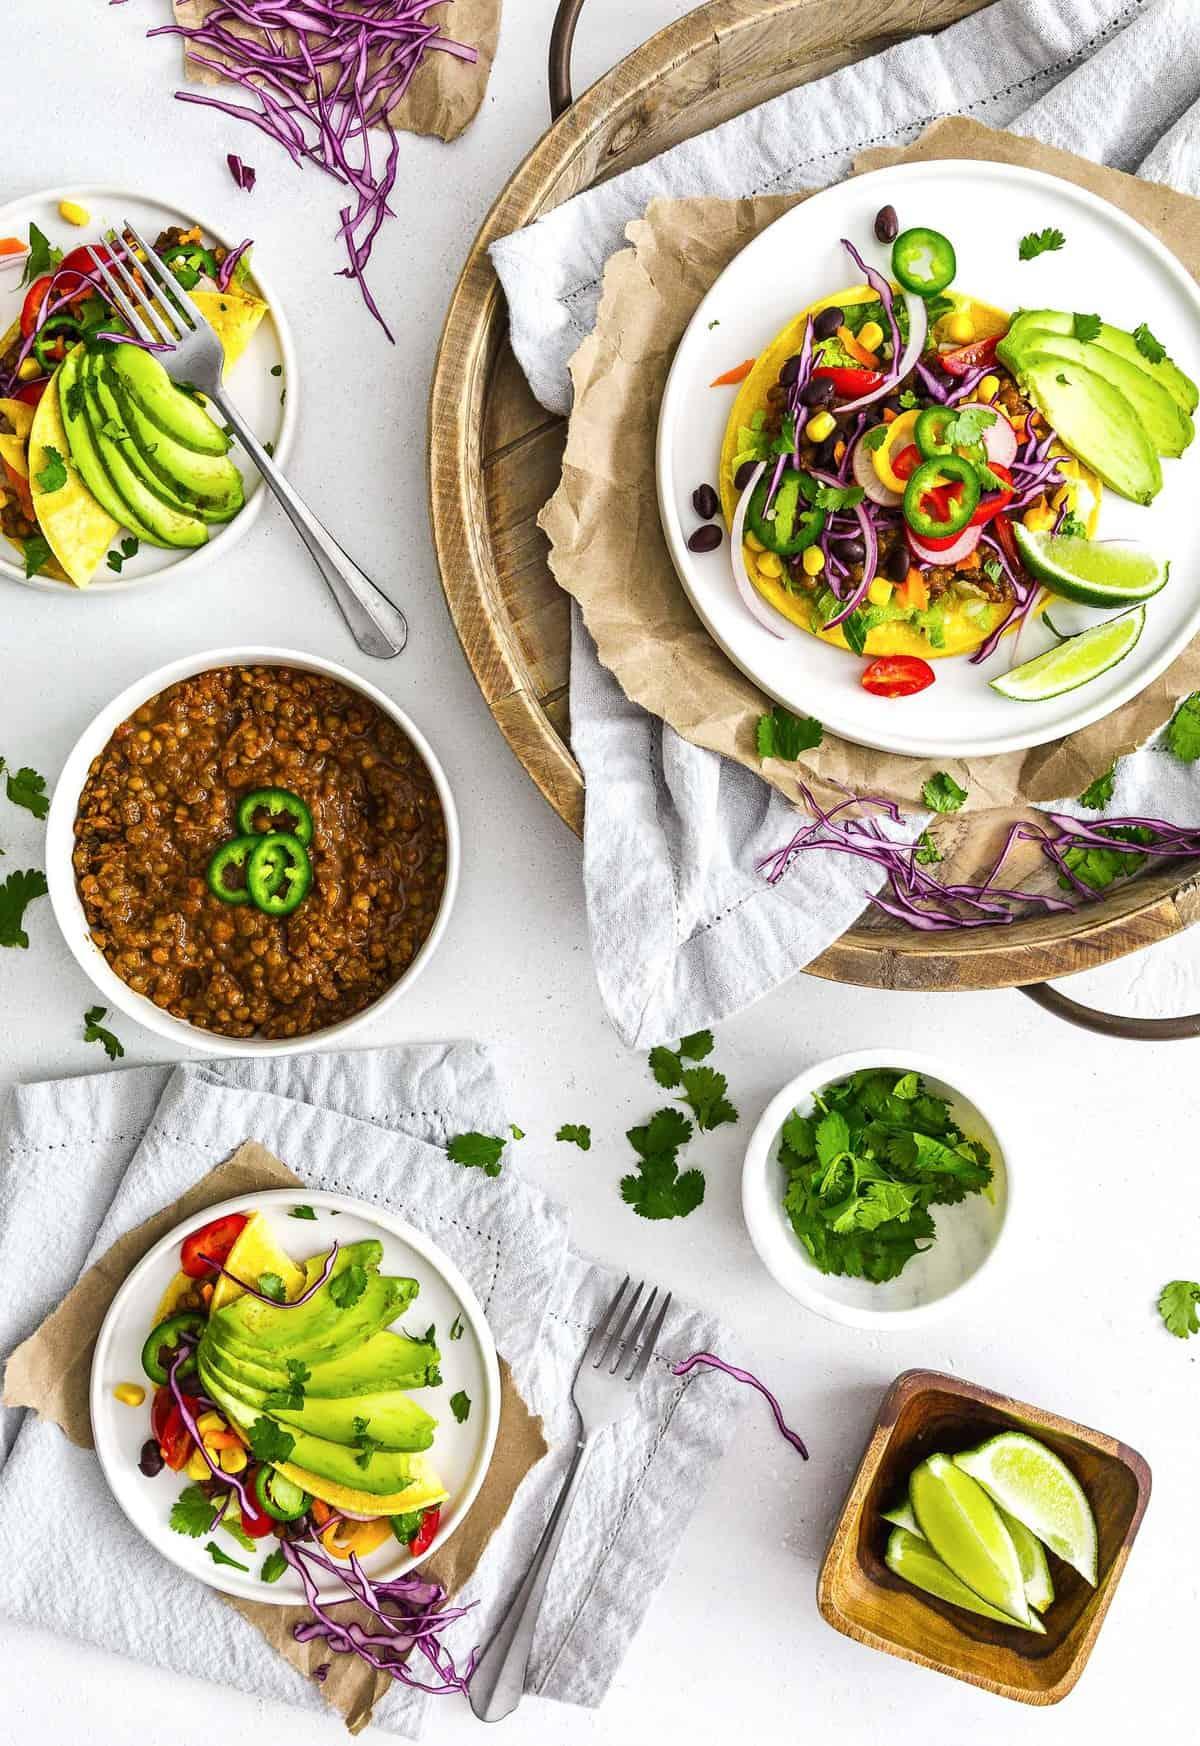 Instant Pot Lentil Tacos, plant based, vegan, vegetarian, whole food plant based, gluten free, recipe, wfpb, healthy, healthy vegan, oil free, no refined sugar, no oil, refined sugar free, dairy free, lentils, tacos, dinner, Instant Pot